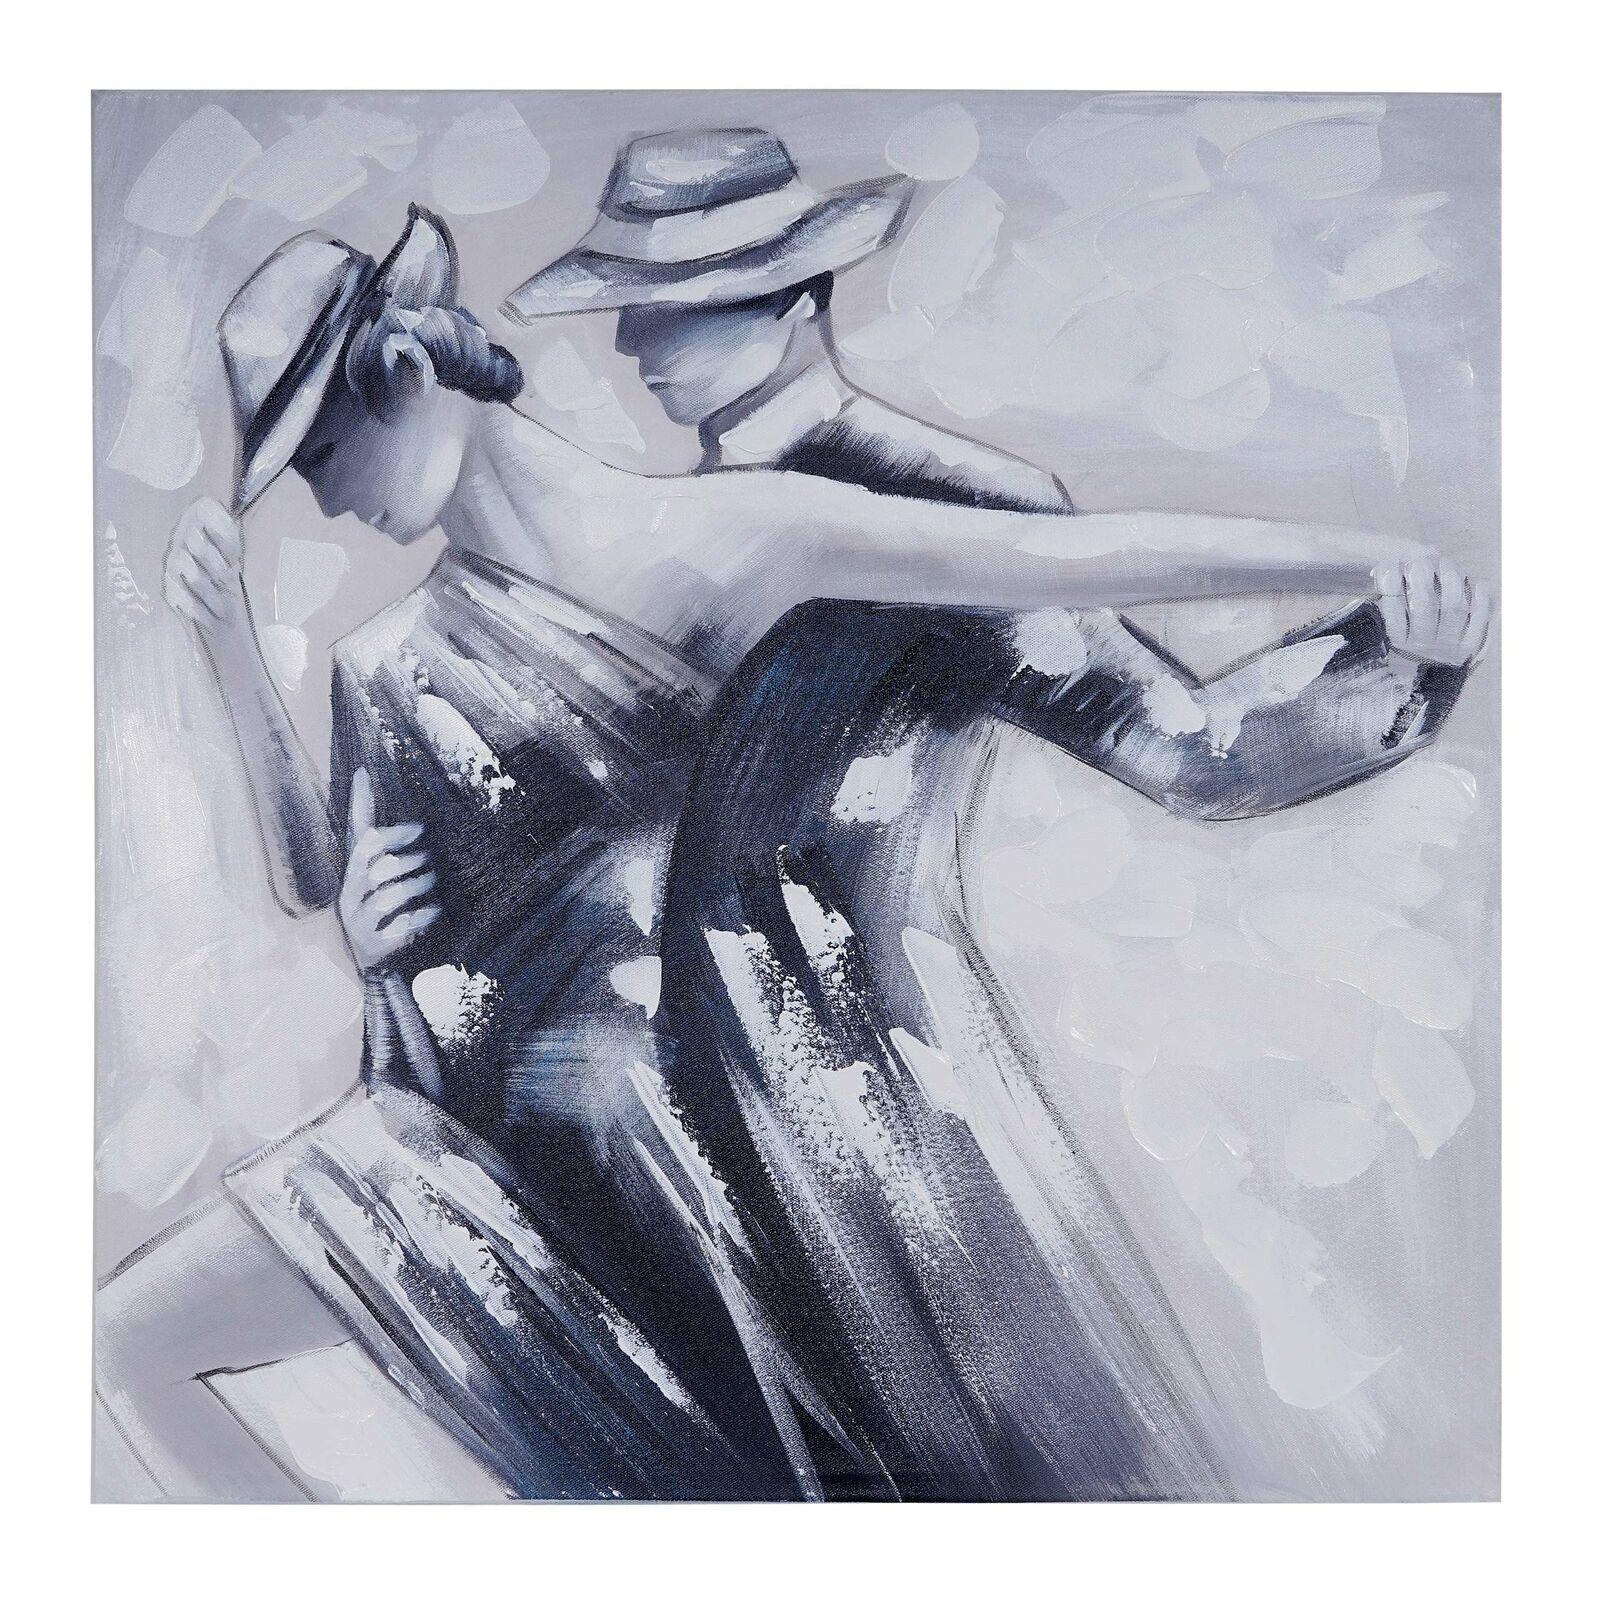 Ölgemälde Tanzpaar, 100% handgemaltes Wandbild Gemälde XL, 80x80cm